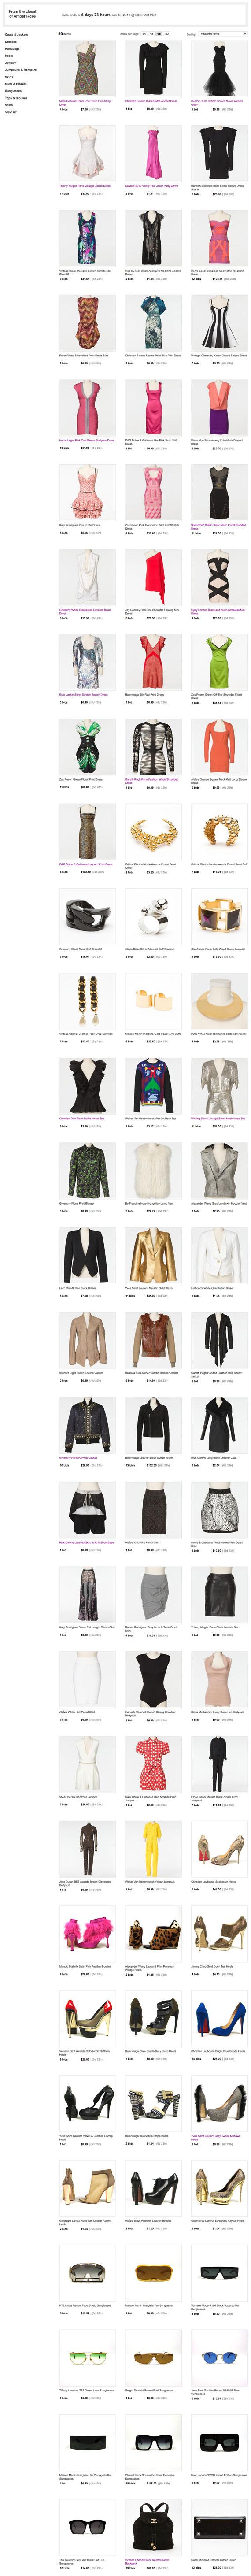 Shop Amber Roses Closet on eBay Fashion Vault